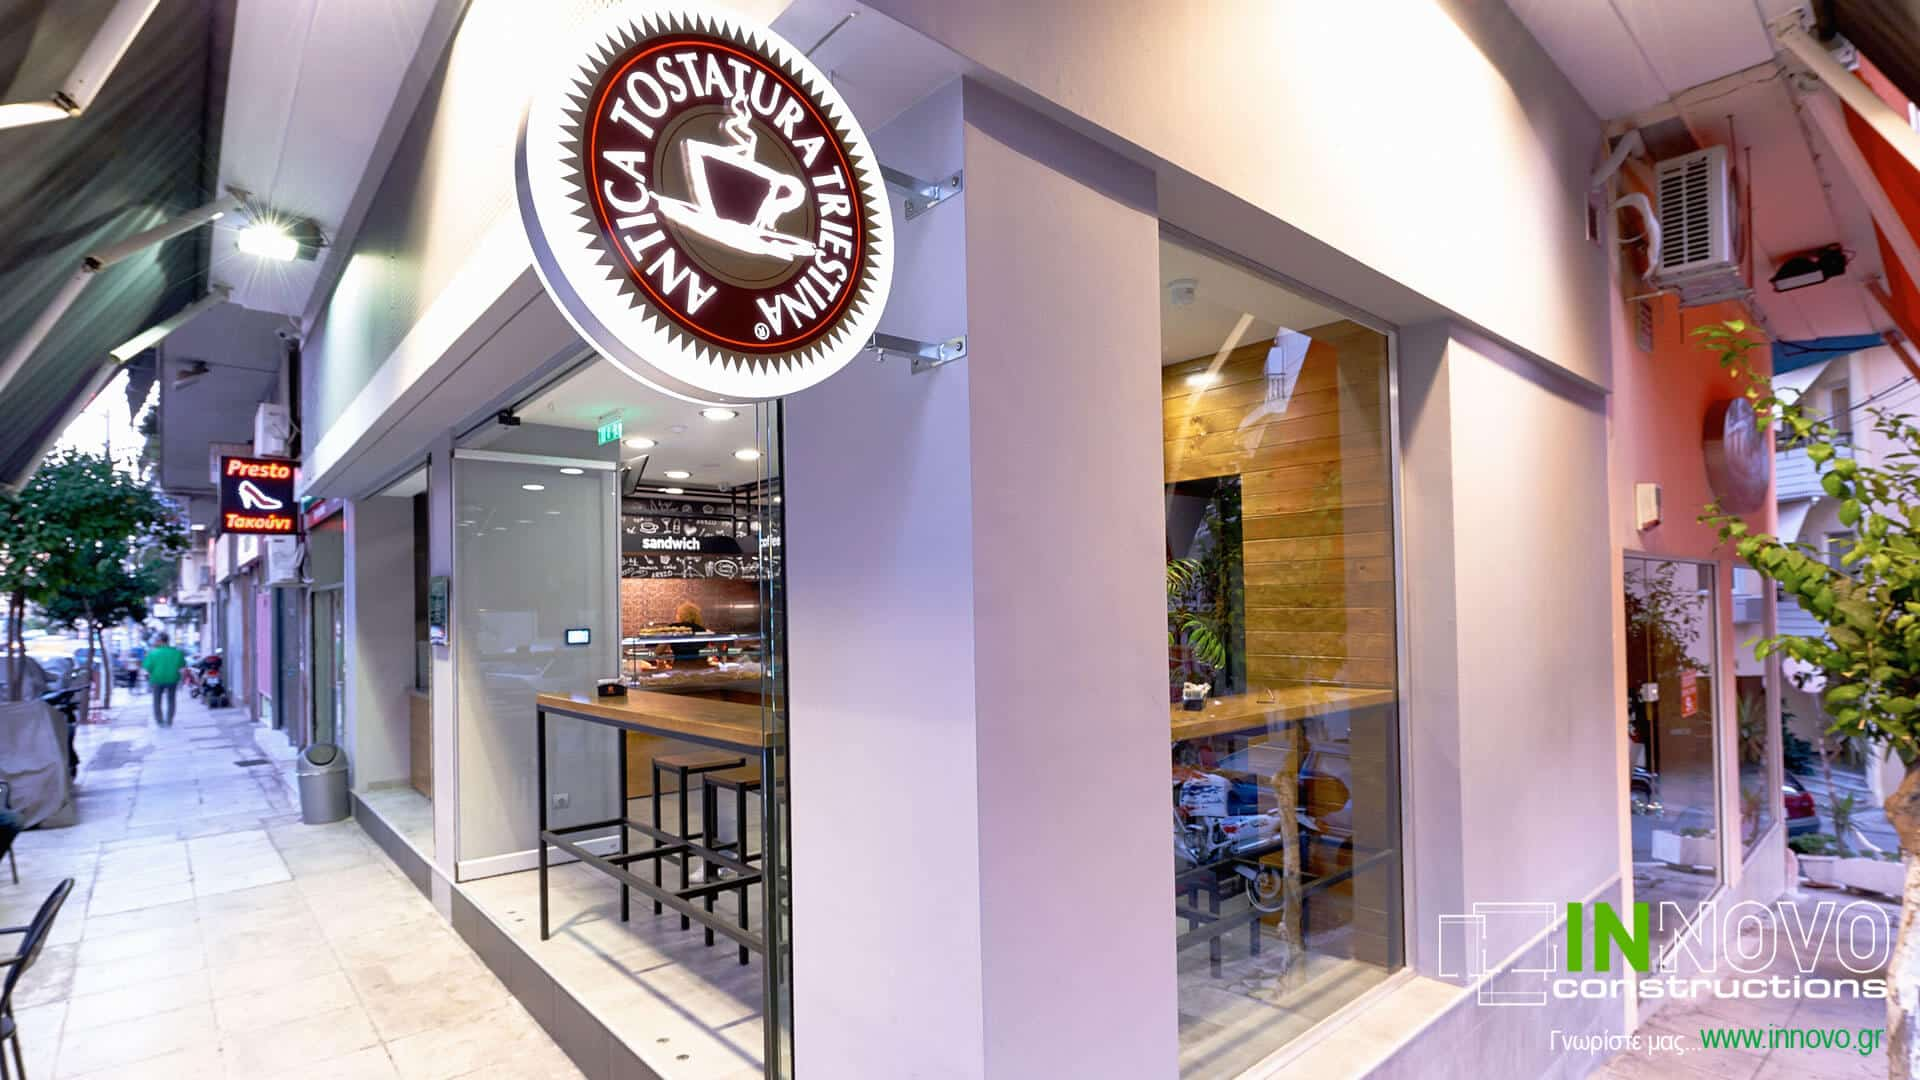 anakainisi-snack-cafe-renovation-snack-cafe-peiraias-1545-9